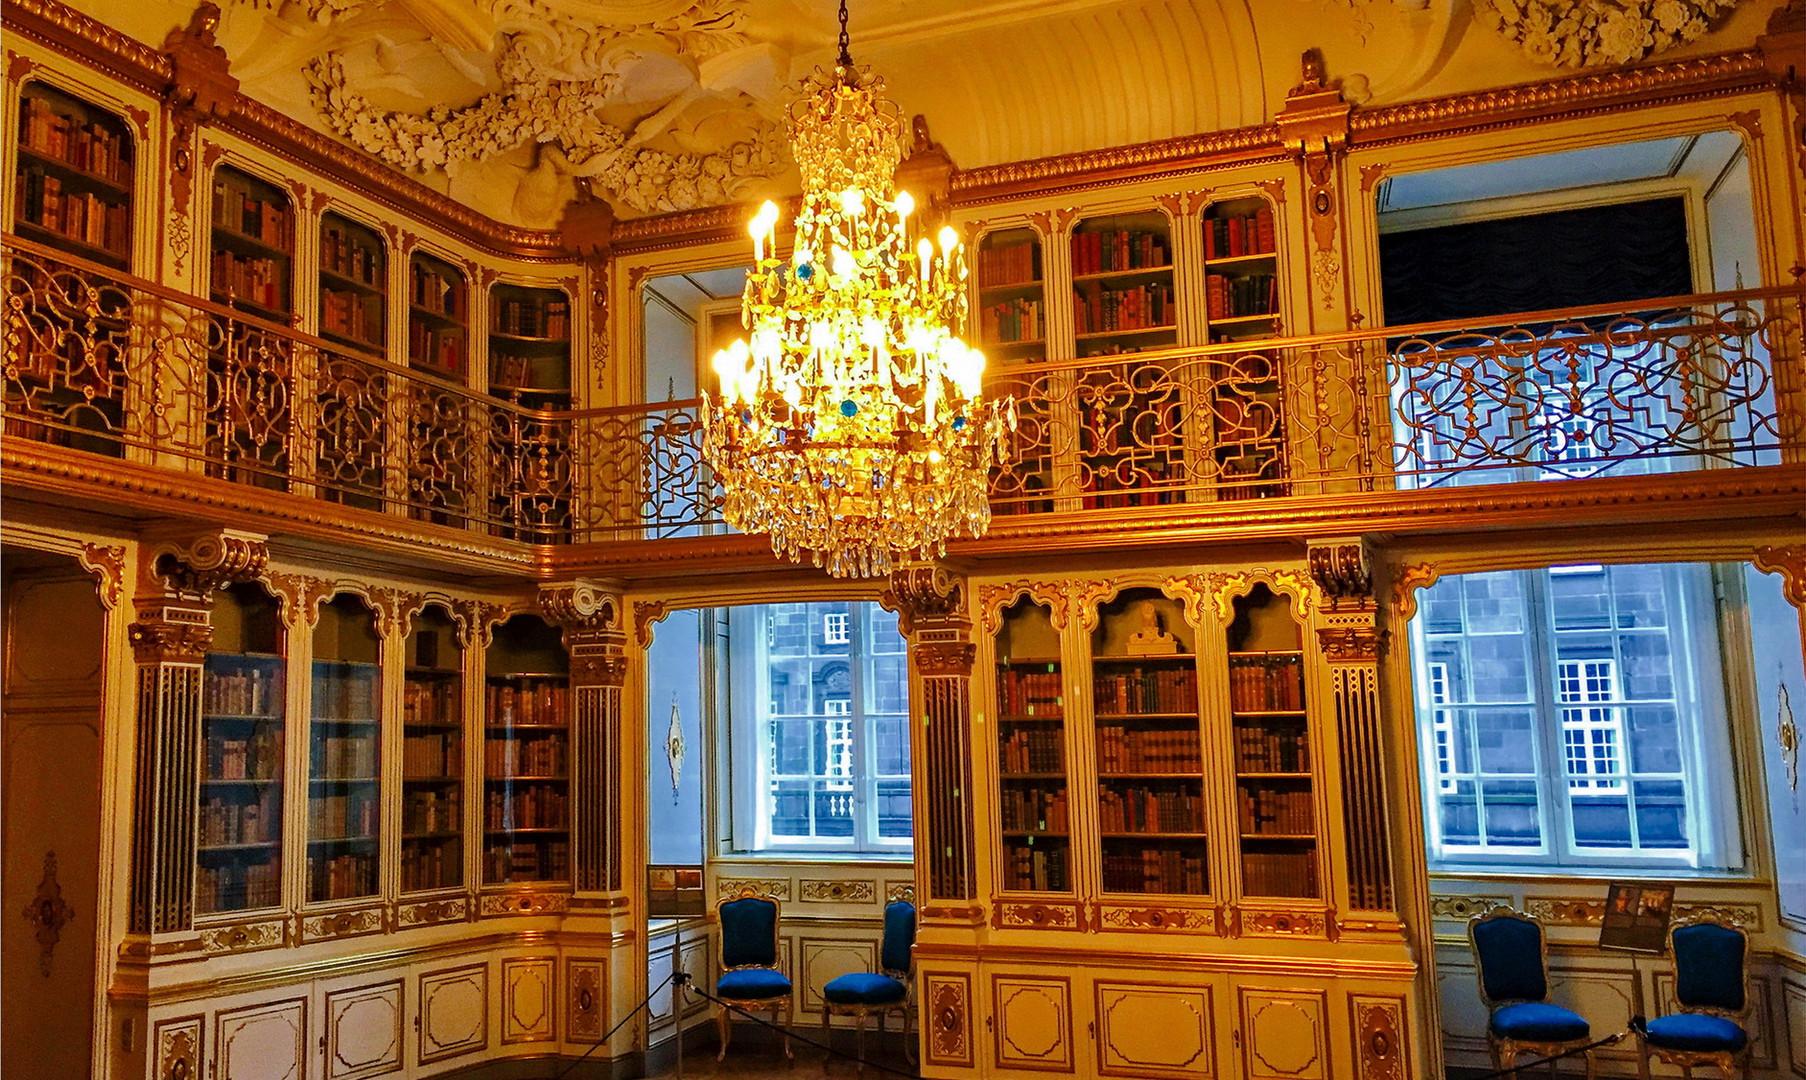 Экспозиция внутри замка Кристиансборг, Копенгаген